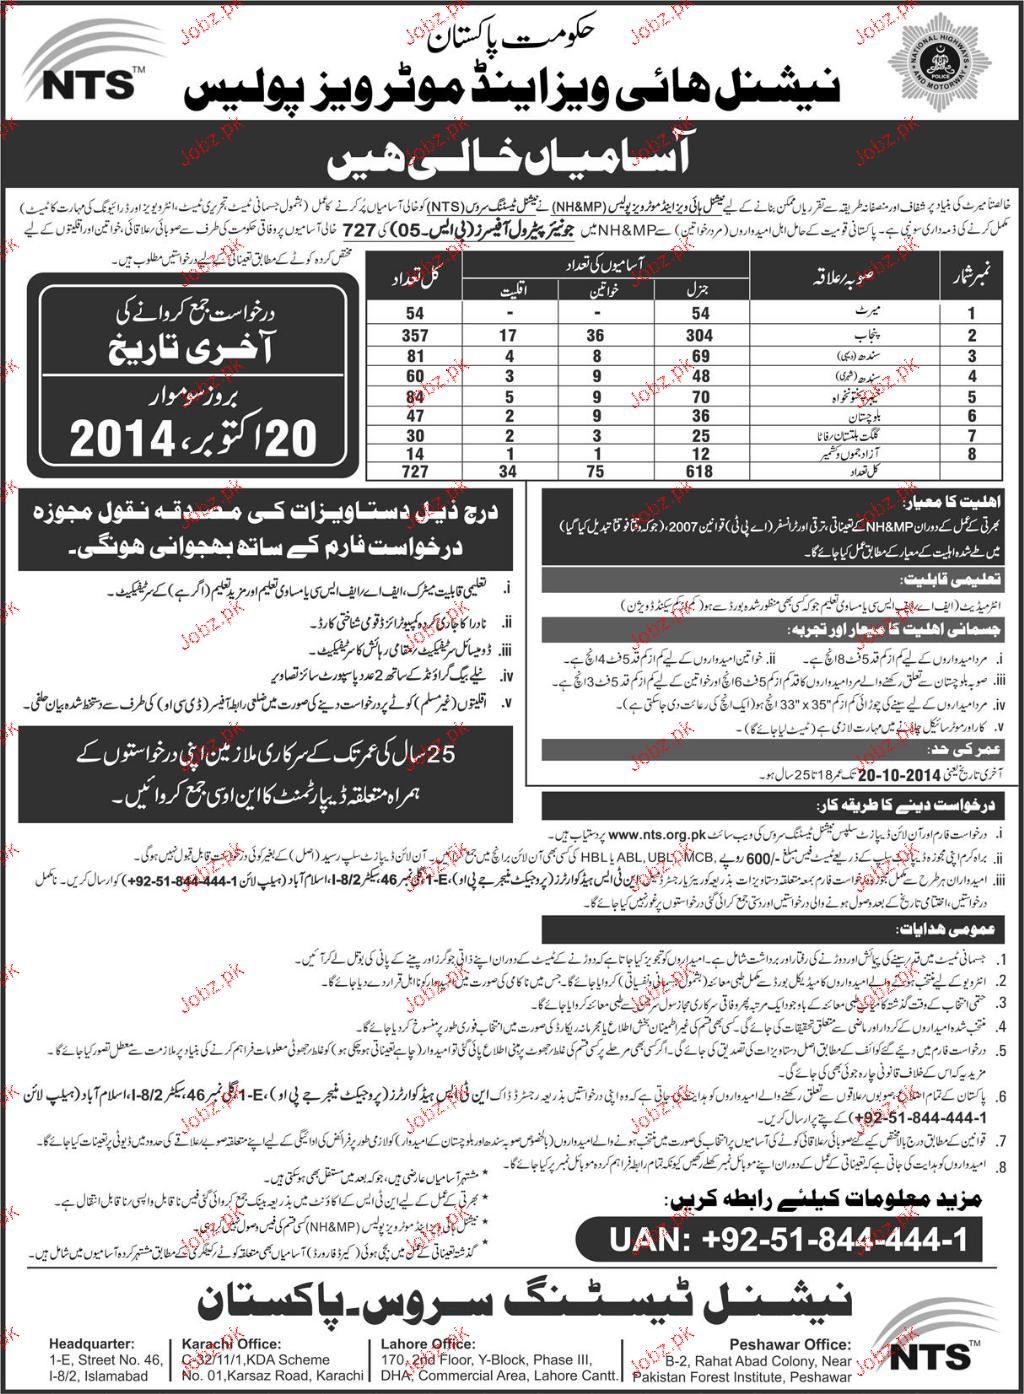 Recruitment of Junior Petrol Officers in Pakistan Motorway